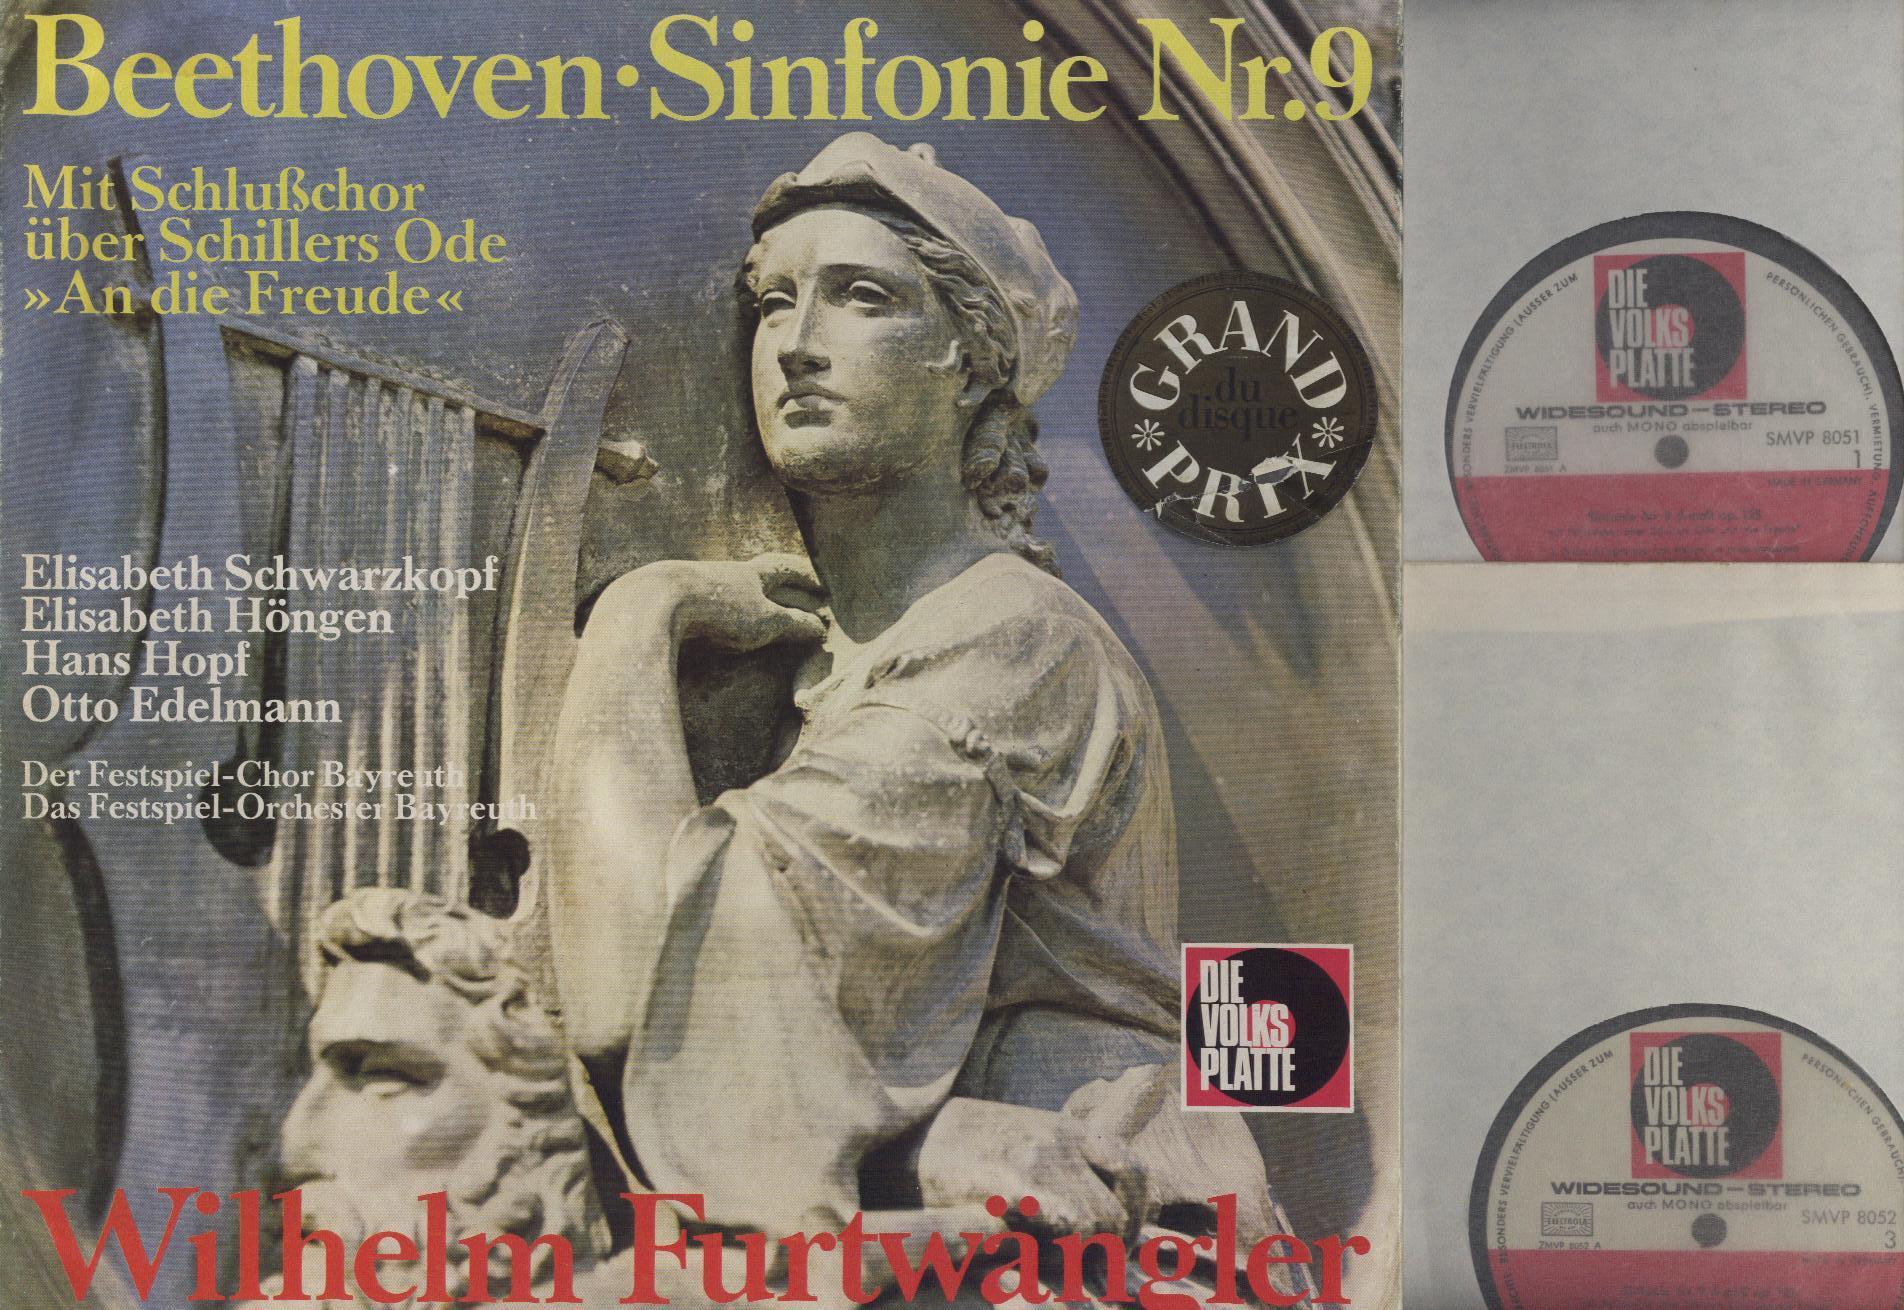 Ludwig van Beethoven, Wilhelm Furtwängler - Sinfonie Nr. 9 Mit Schlusschor Uber Schillers Ode ''An Die Freude'' - LP Box Set